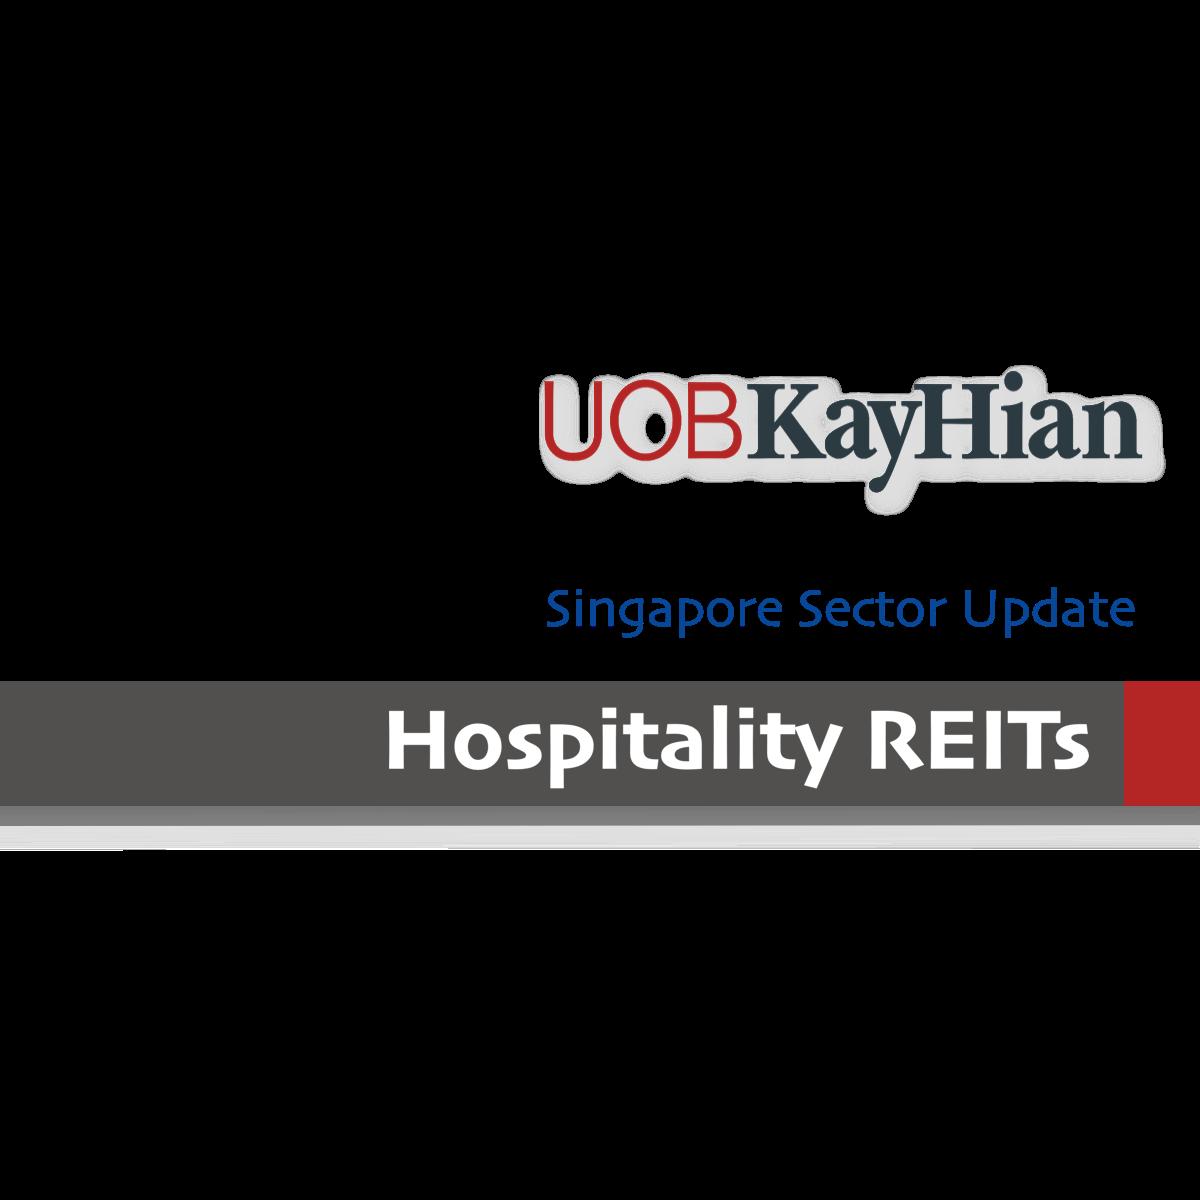 Hospitality REITs – Singapore - UOB Kay Hian Research | SGinvestors.io